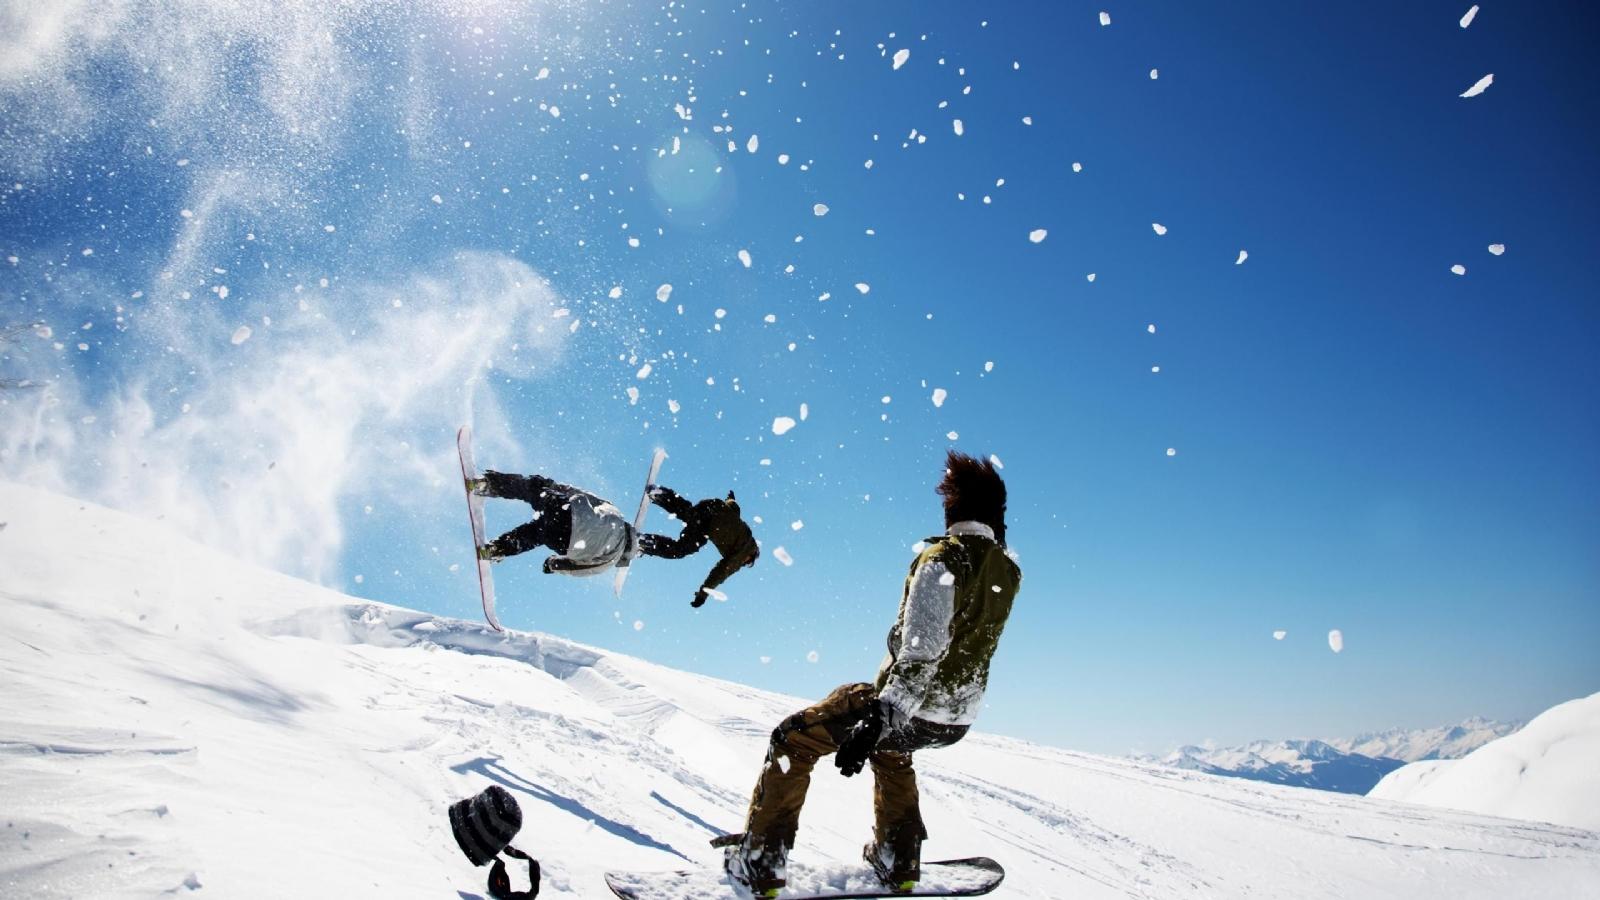 http://4.bp.blogspot.com/-on9izVDDg-Y/Tw0pOjhimLI/AAAAAAAABUI/hQ3zoKcWsGw/s1600/Snowboarding+Wallpaper+7.jpg